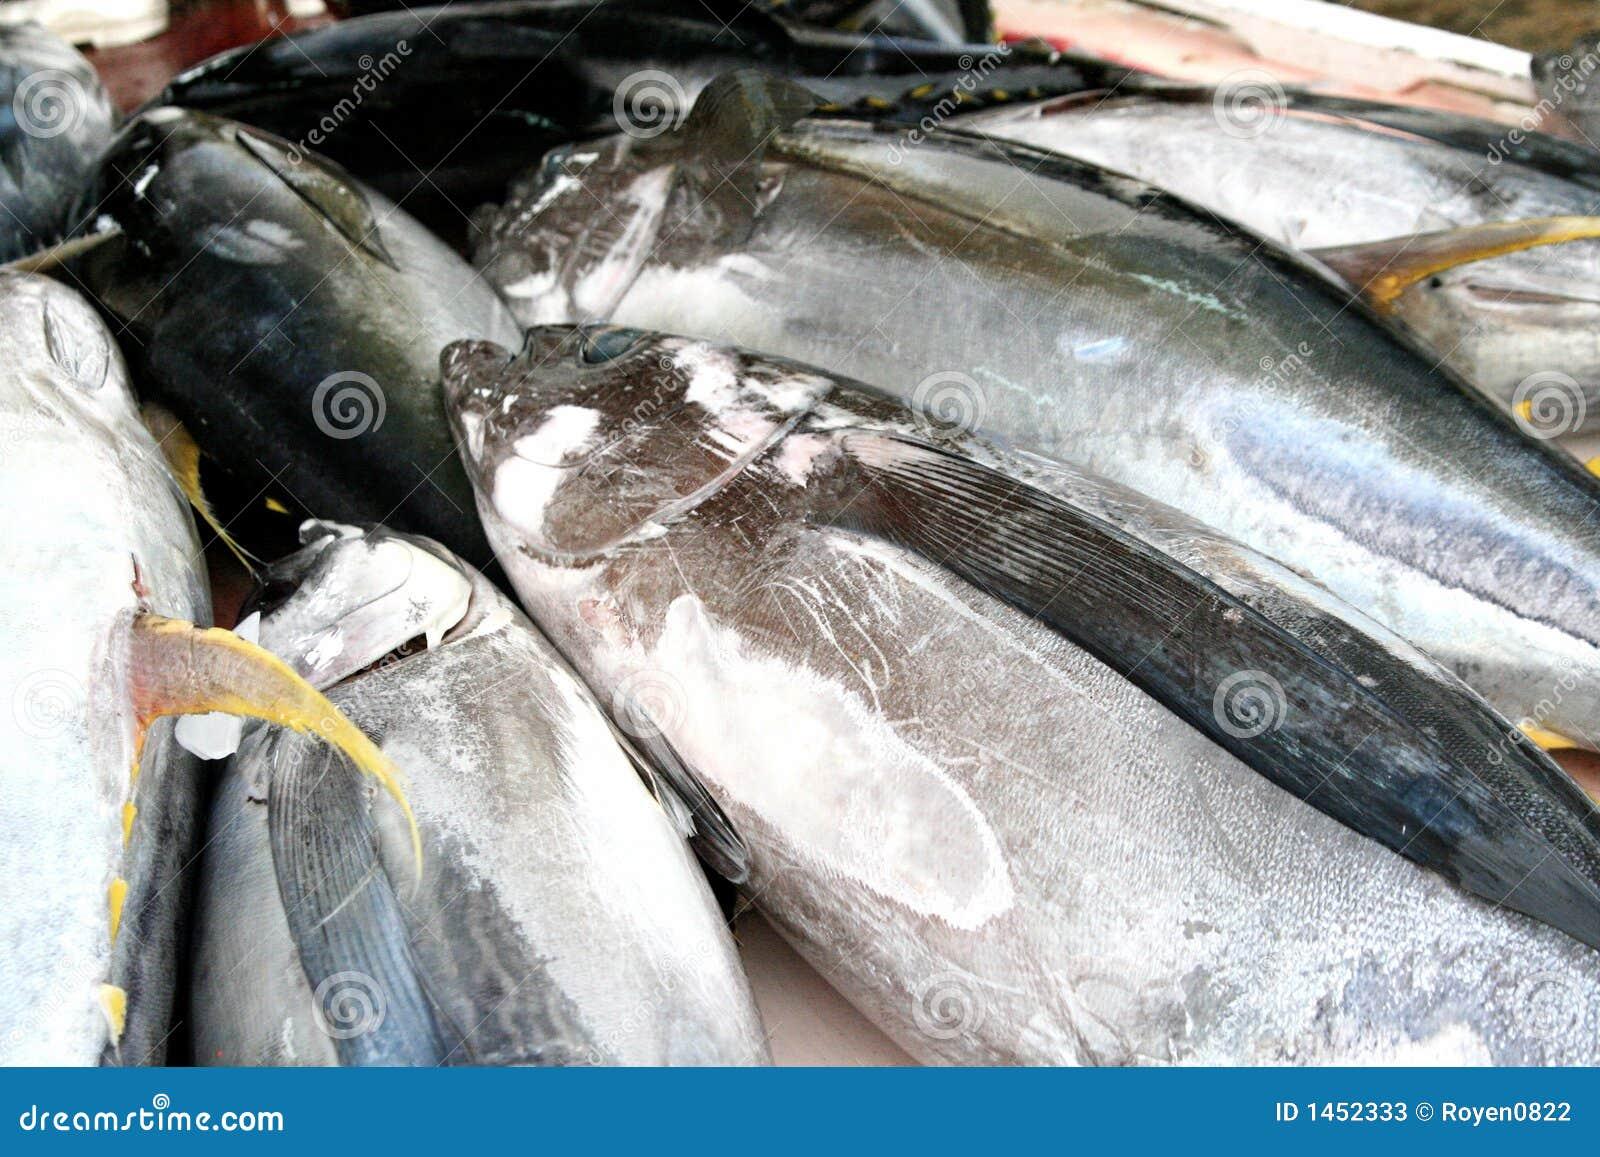 how to catch yellowfin tuna trolling